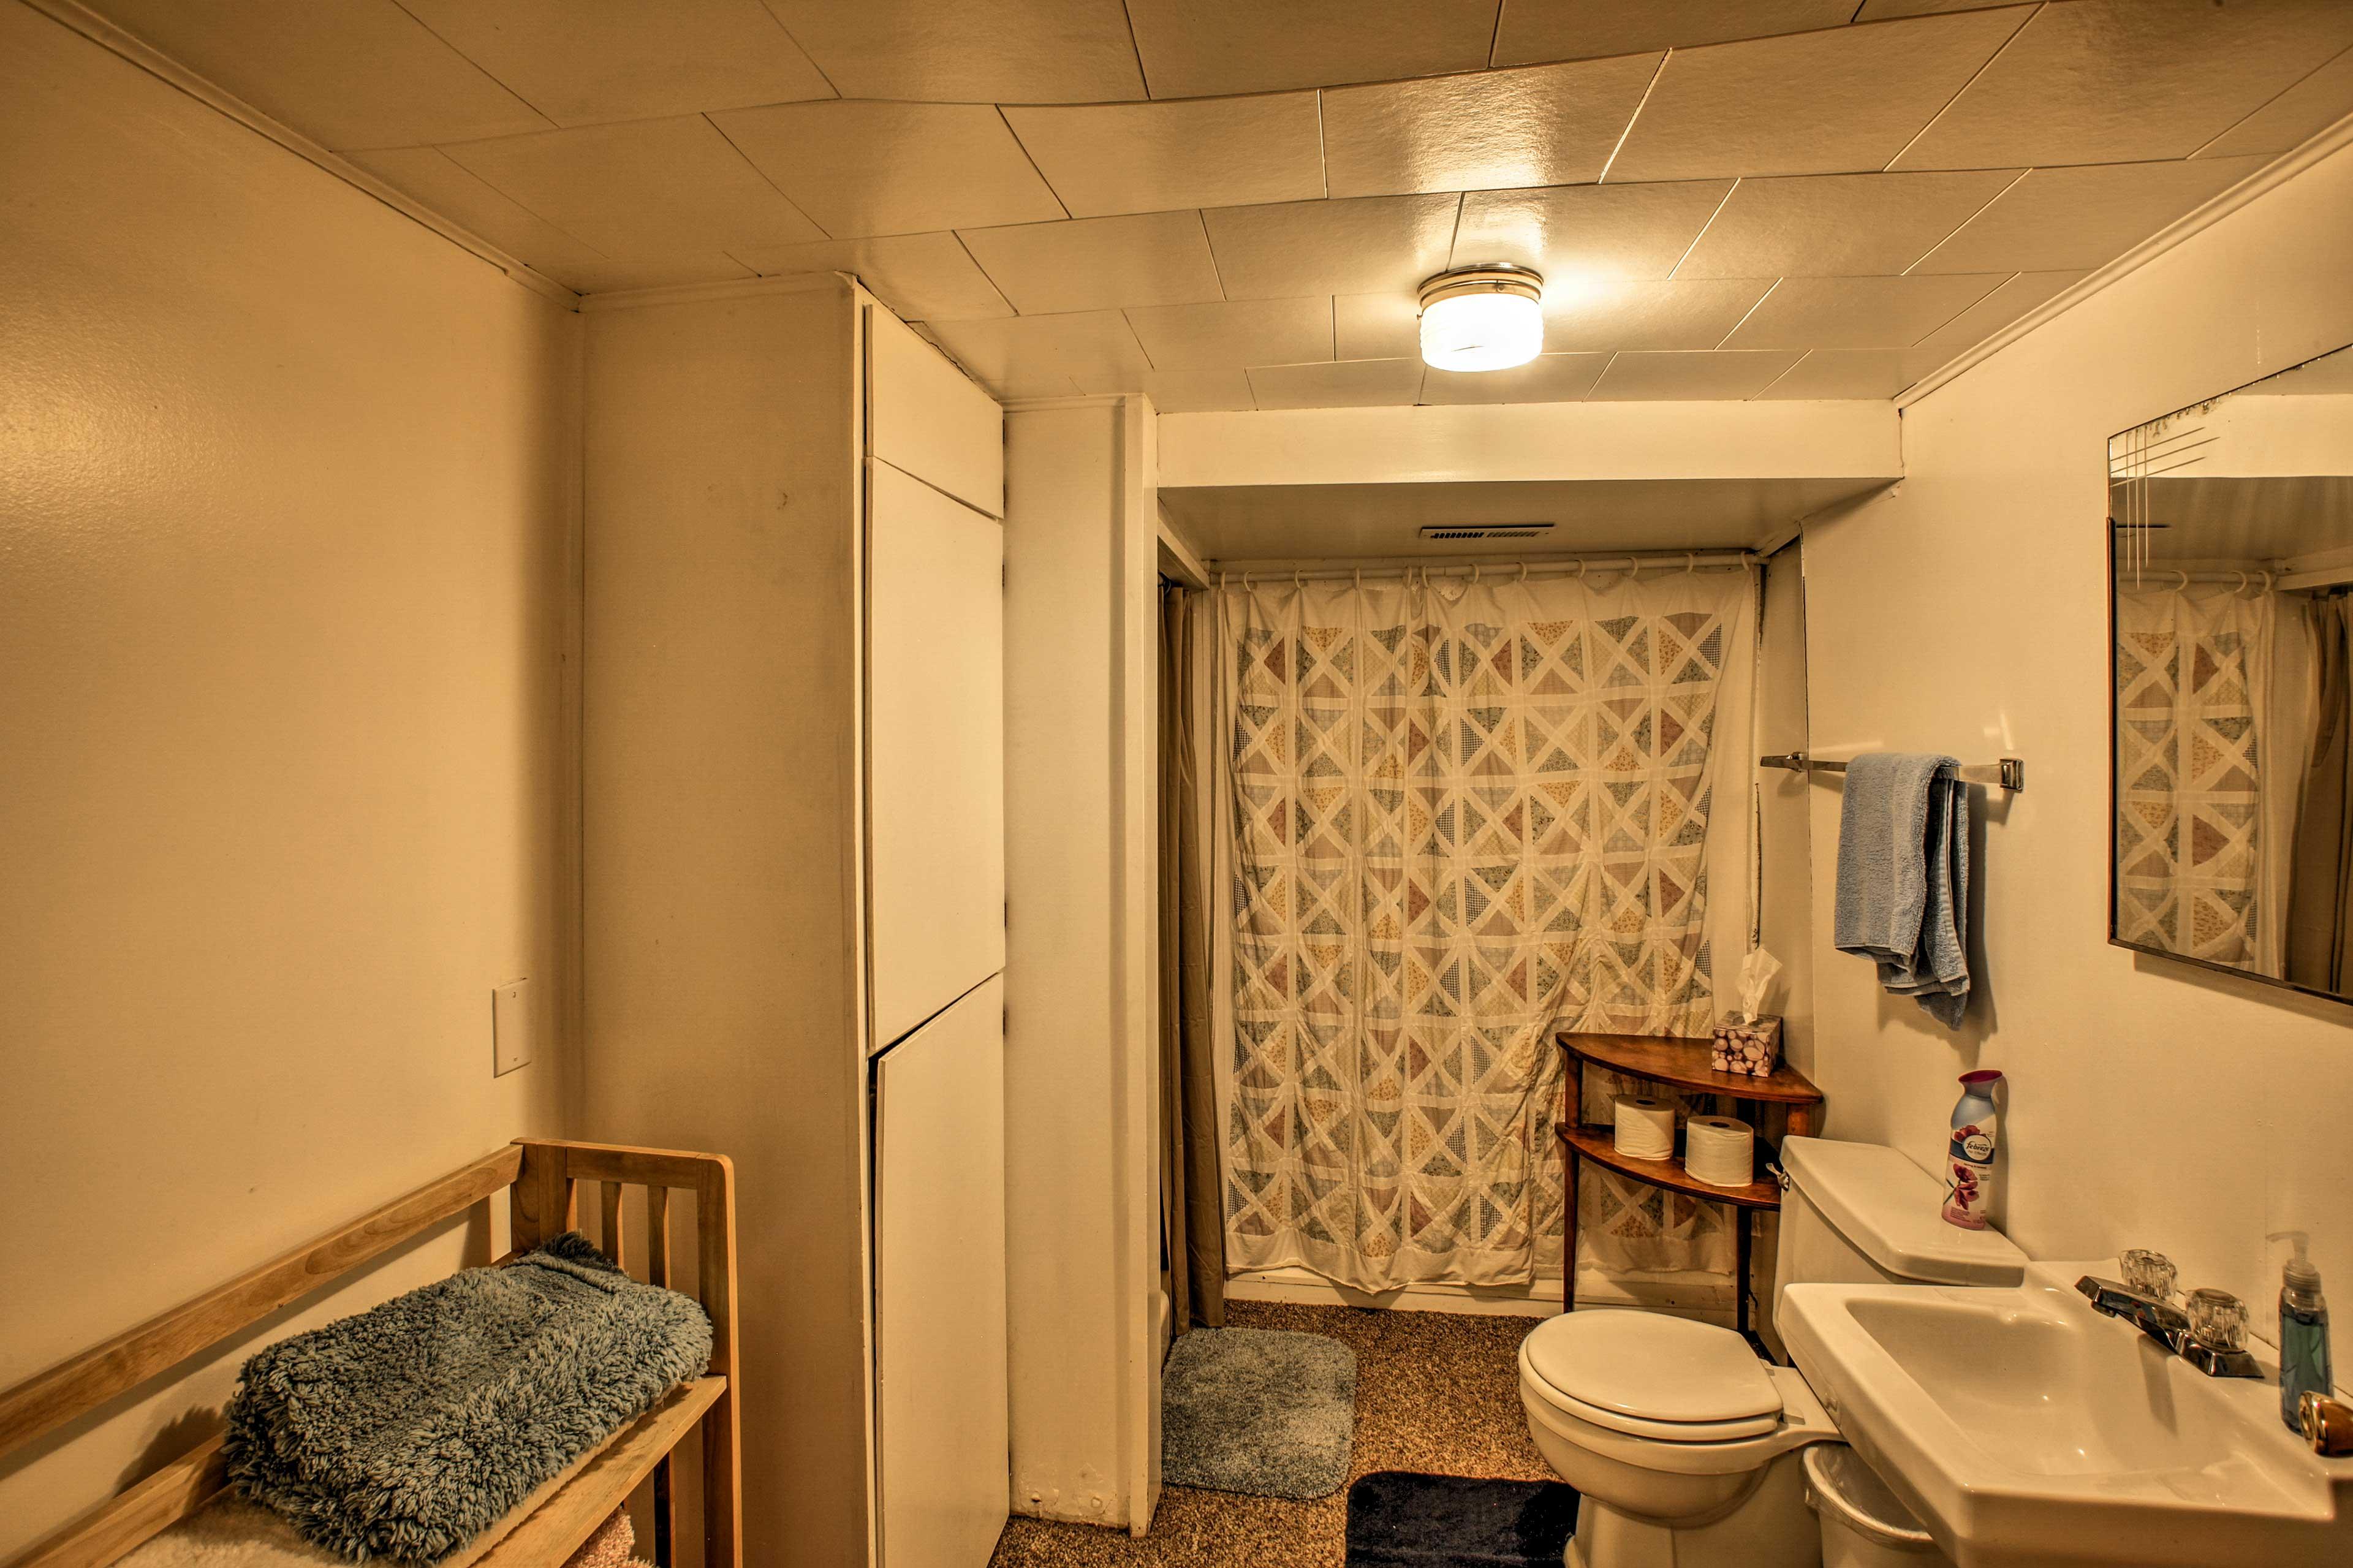 The home has 2 spacious bathrooms.